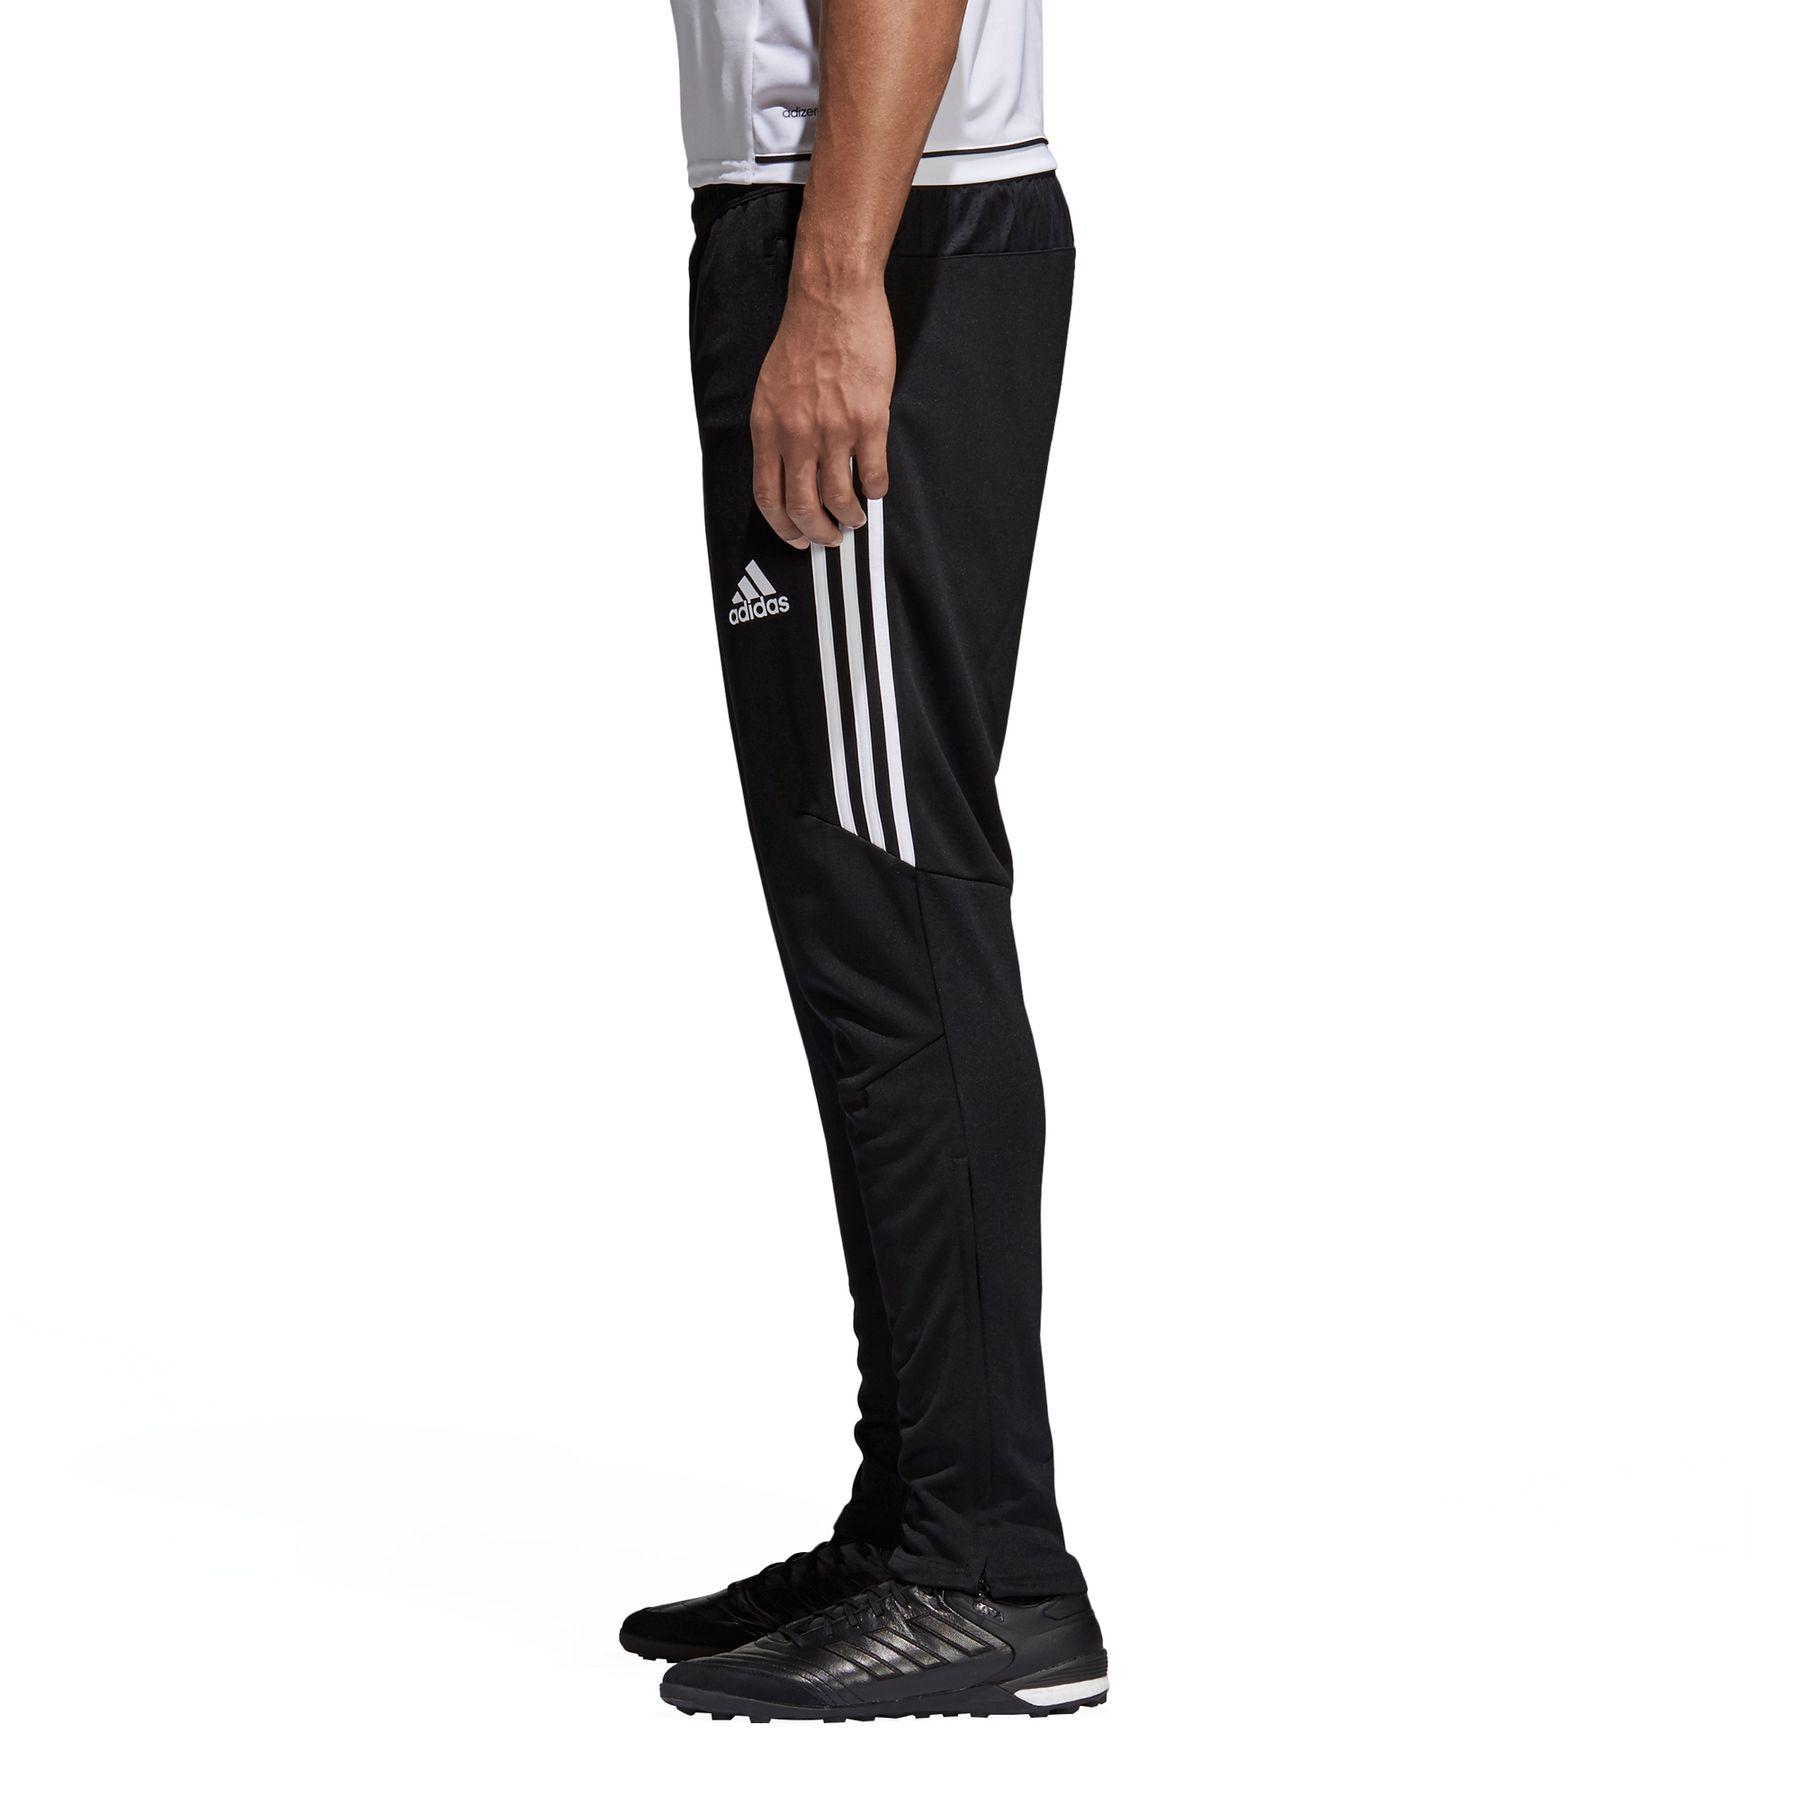 1a9ac22ac6cc56 Adidas Tiro 17 Trainingshose schwarz Herren drei Streifen weiß NEU ...